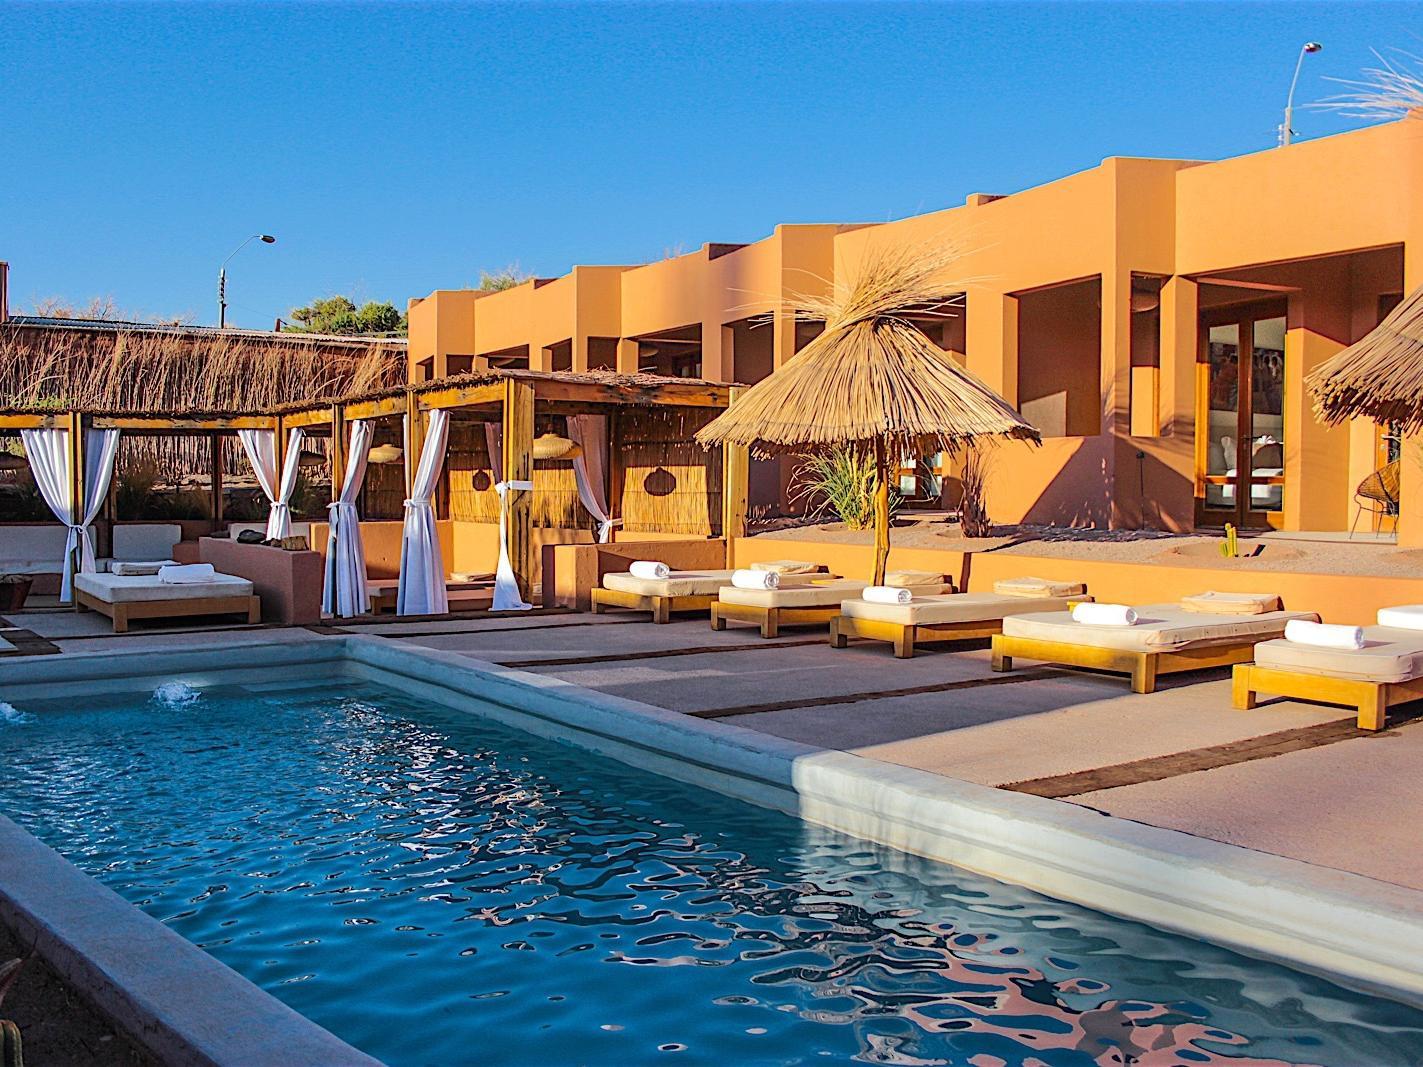 outdoor pool with lounging area at NOI Casa Atacama Hotel